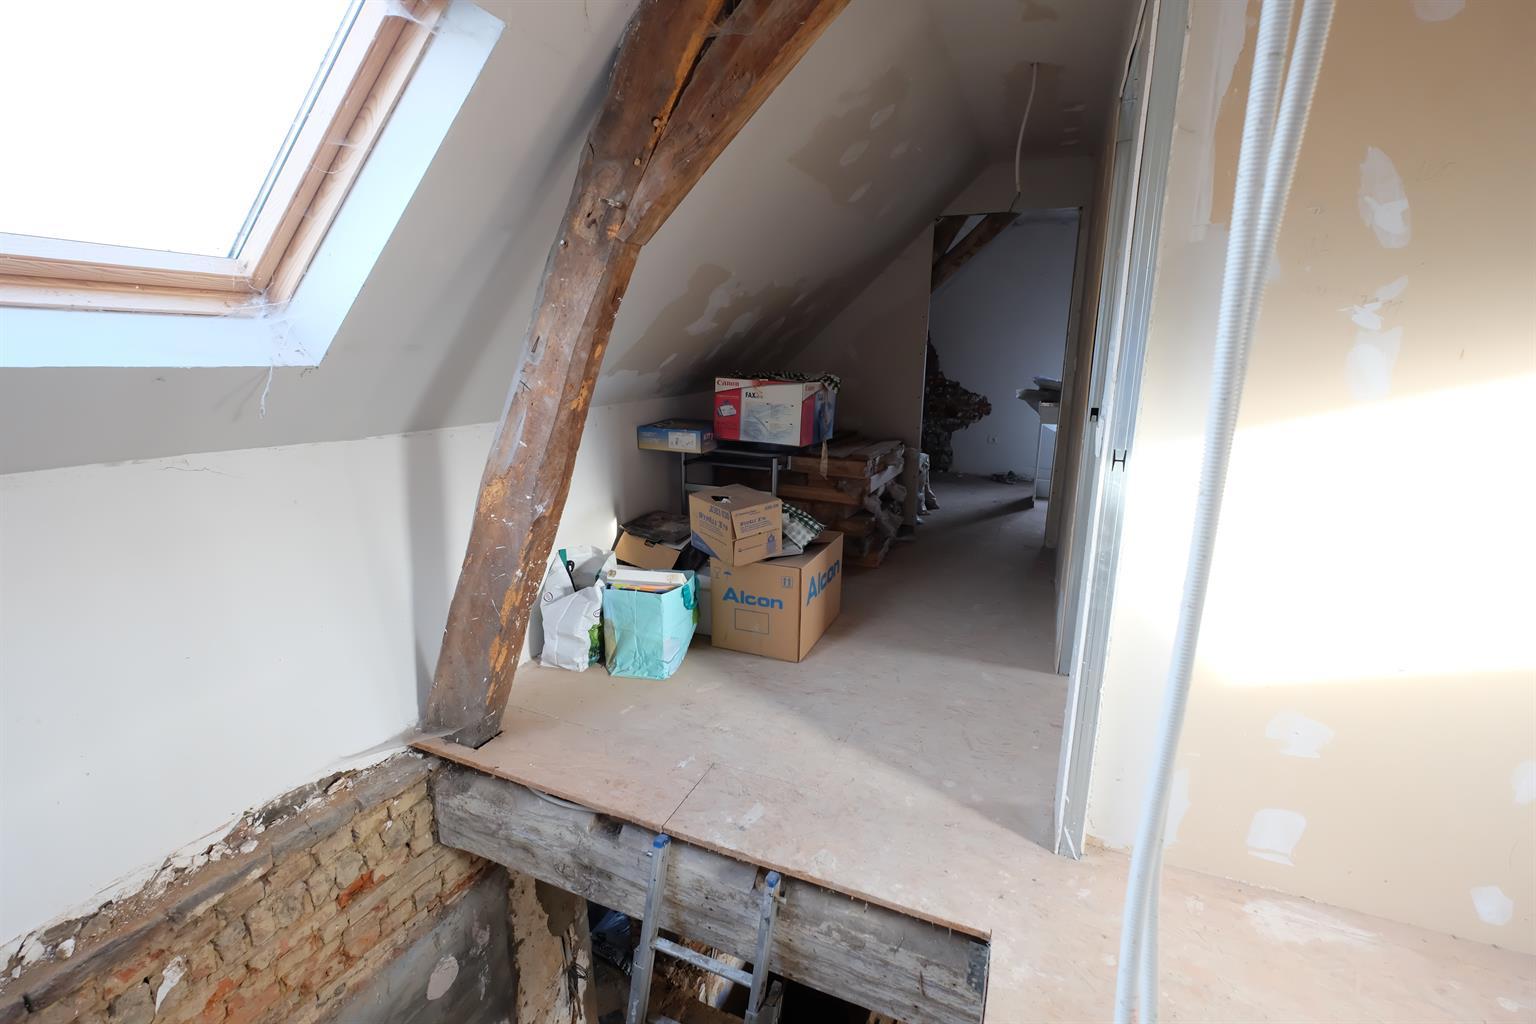 Maison - Tubize Oisquercq - #4252207-1